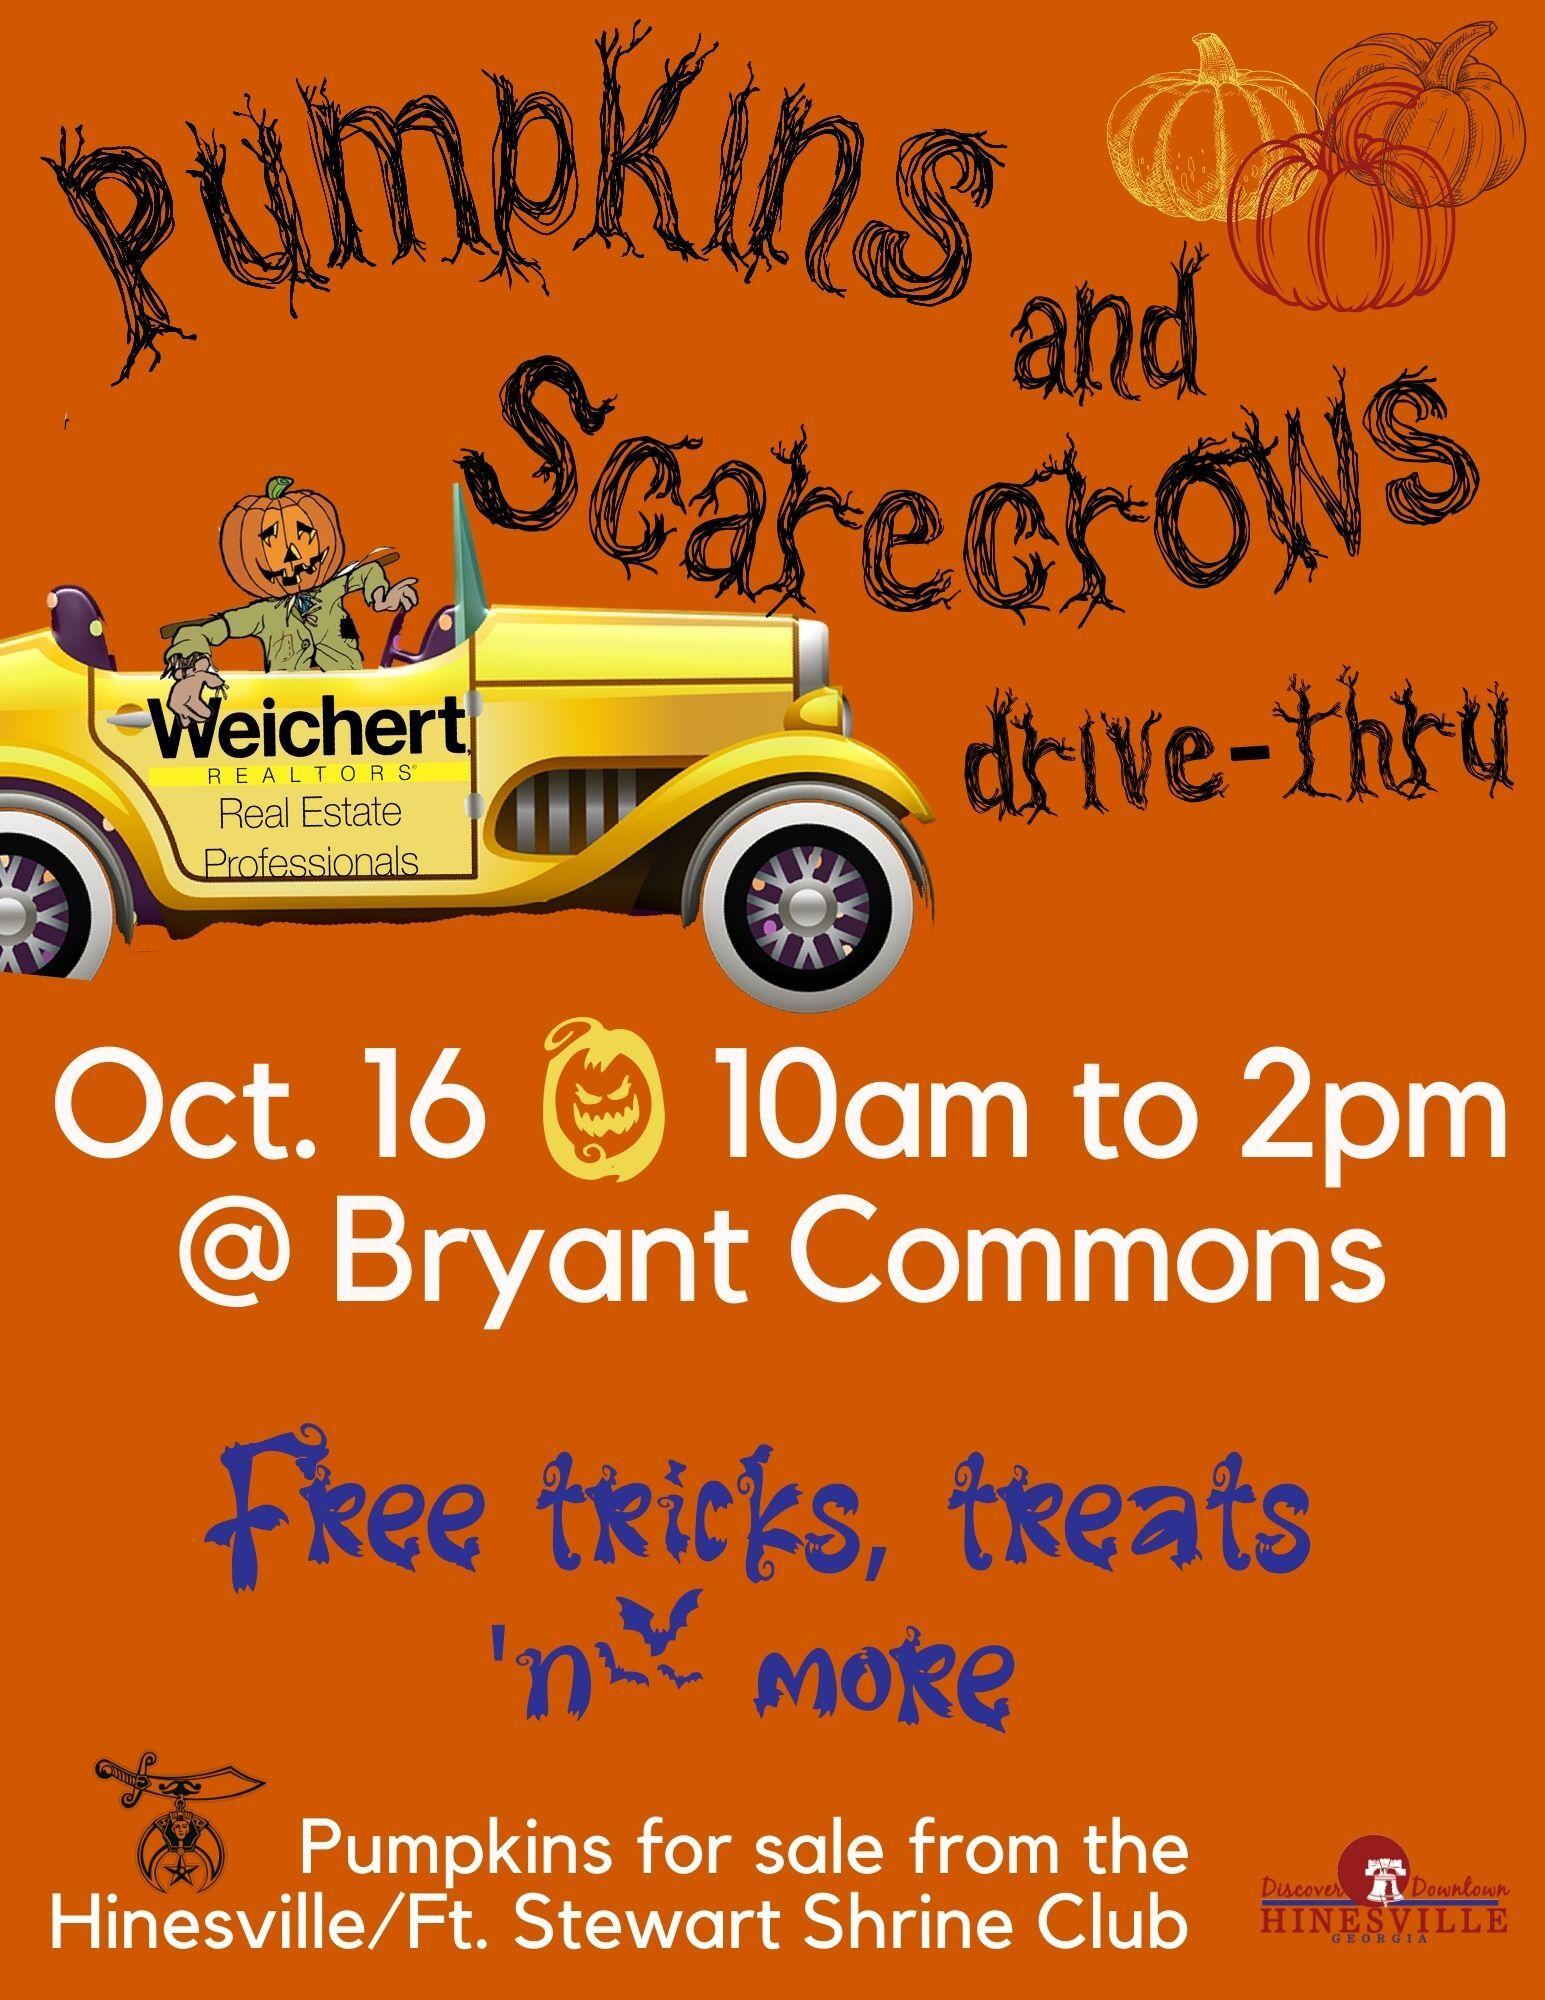 Pumpkins and Scarecrows Drive-Thru